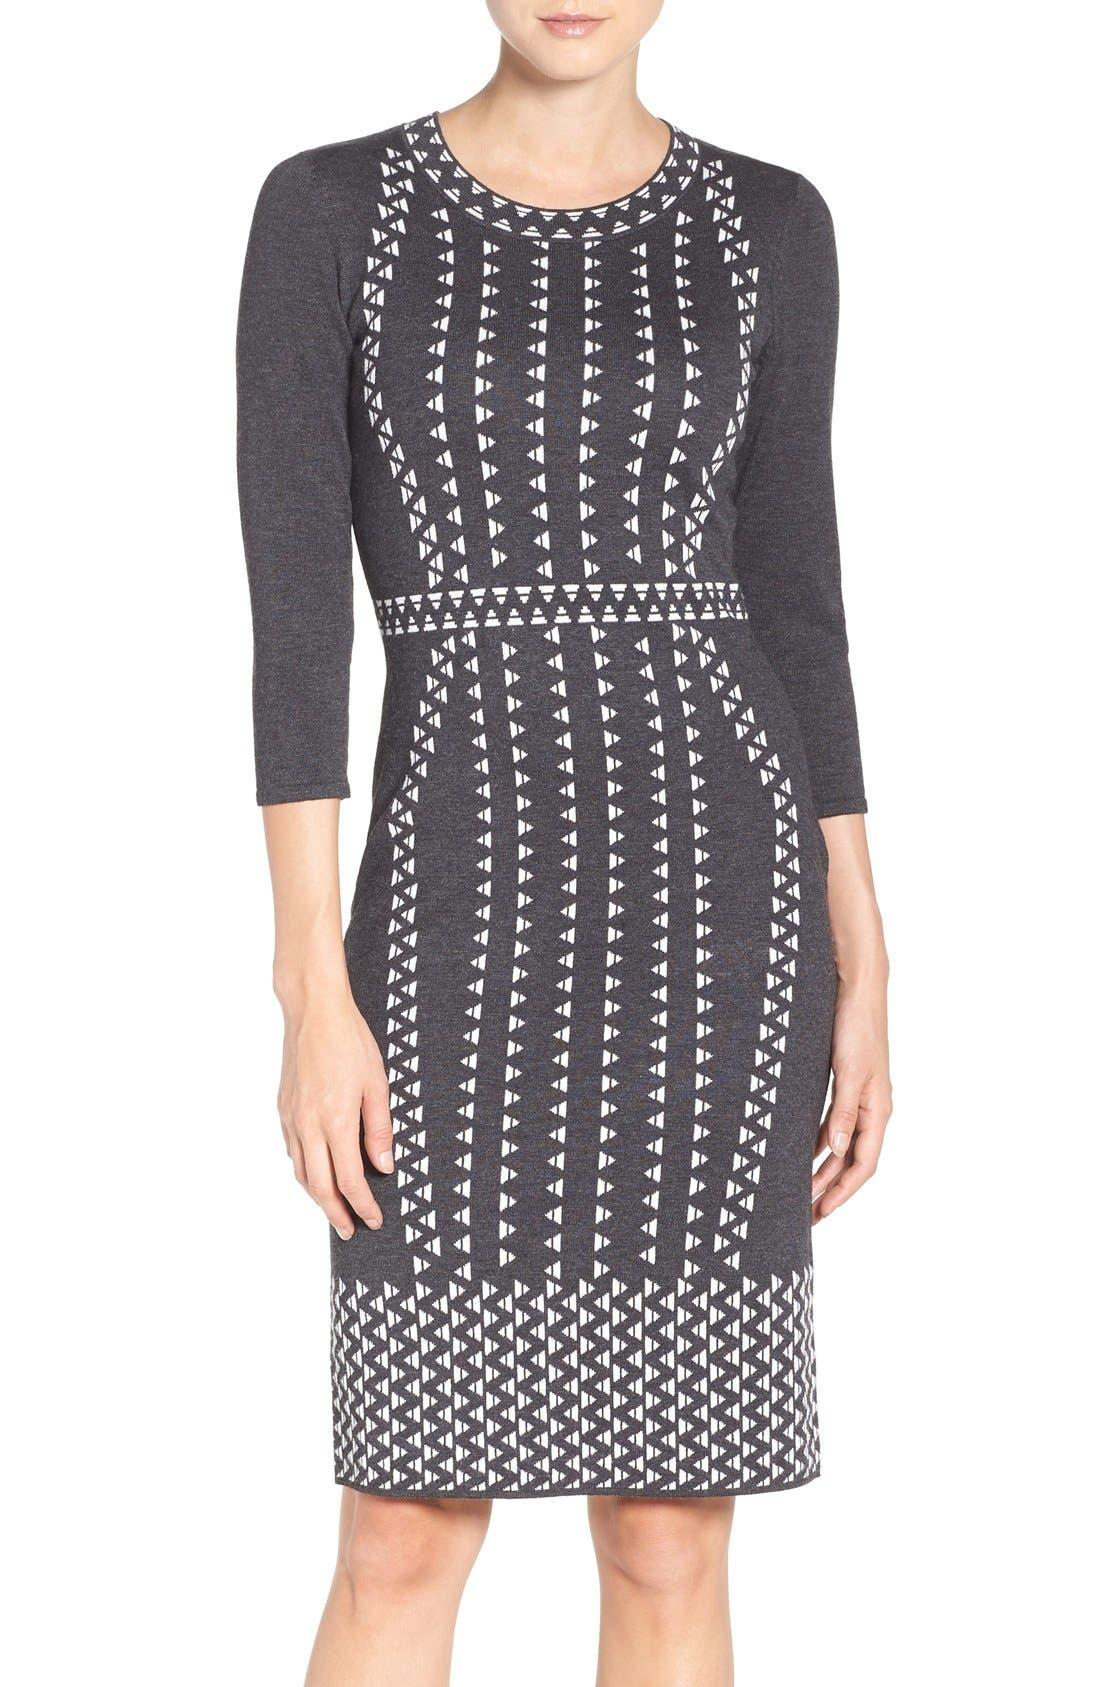 TAYLOR DRESSES Sweater Sheath Dress, Main, color, 021